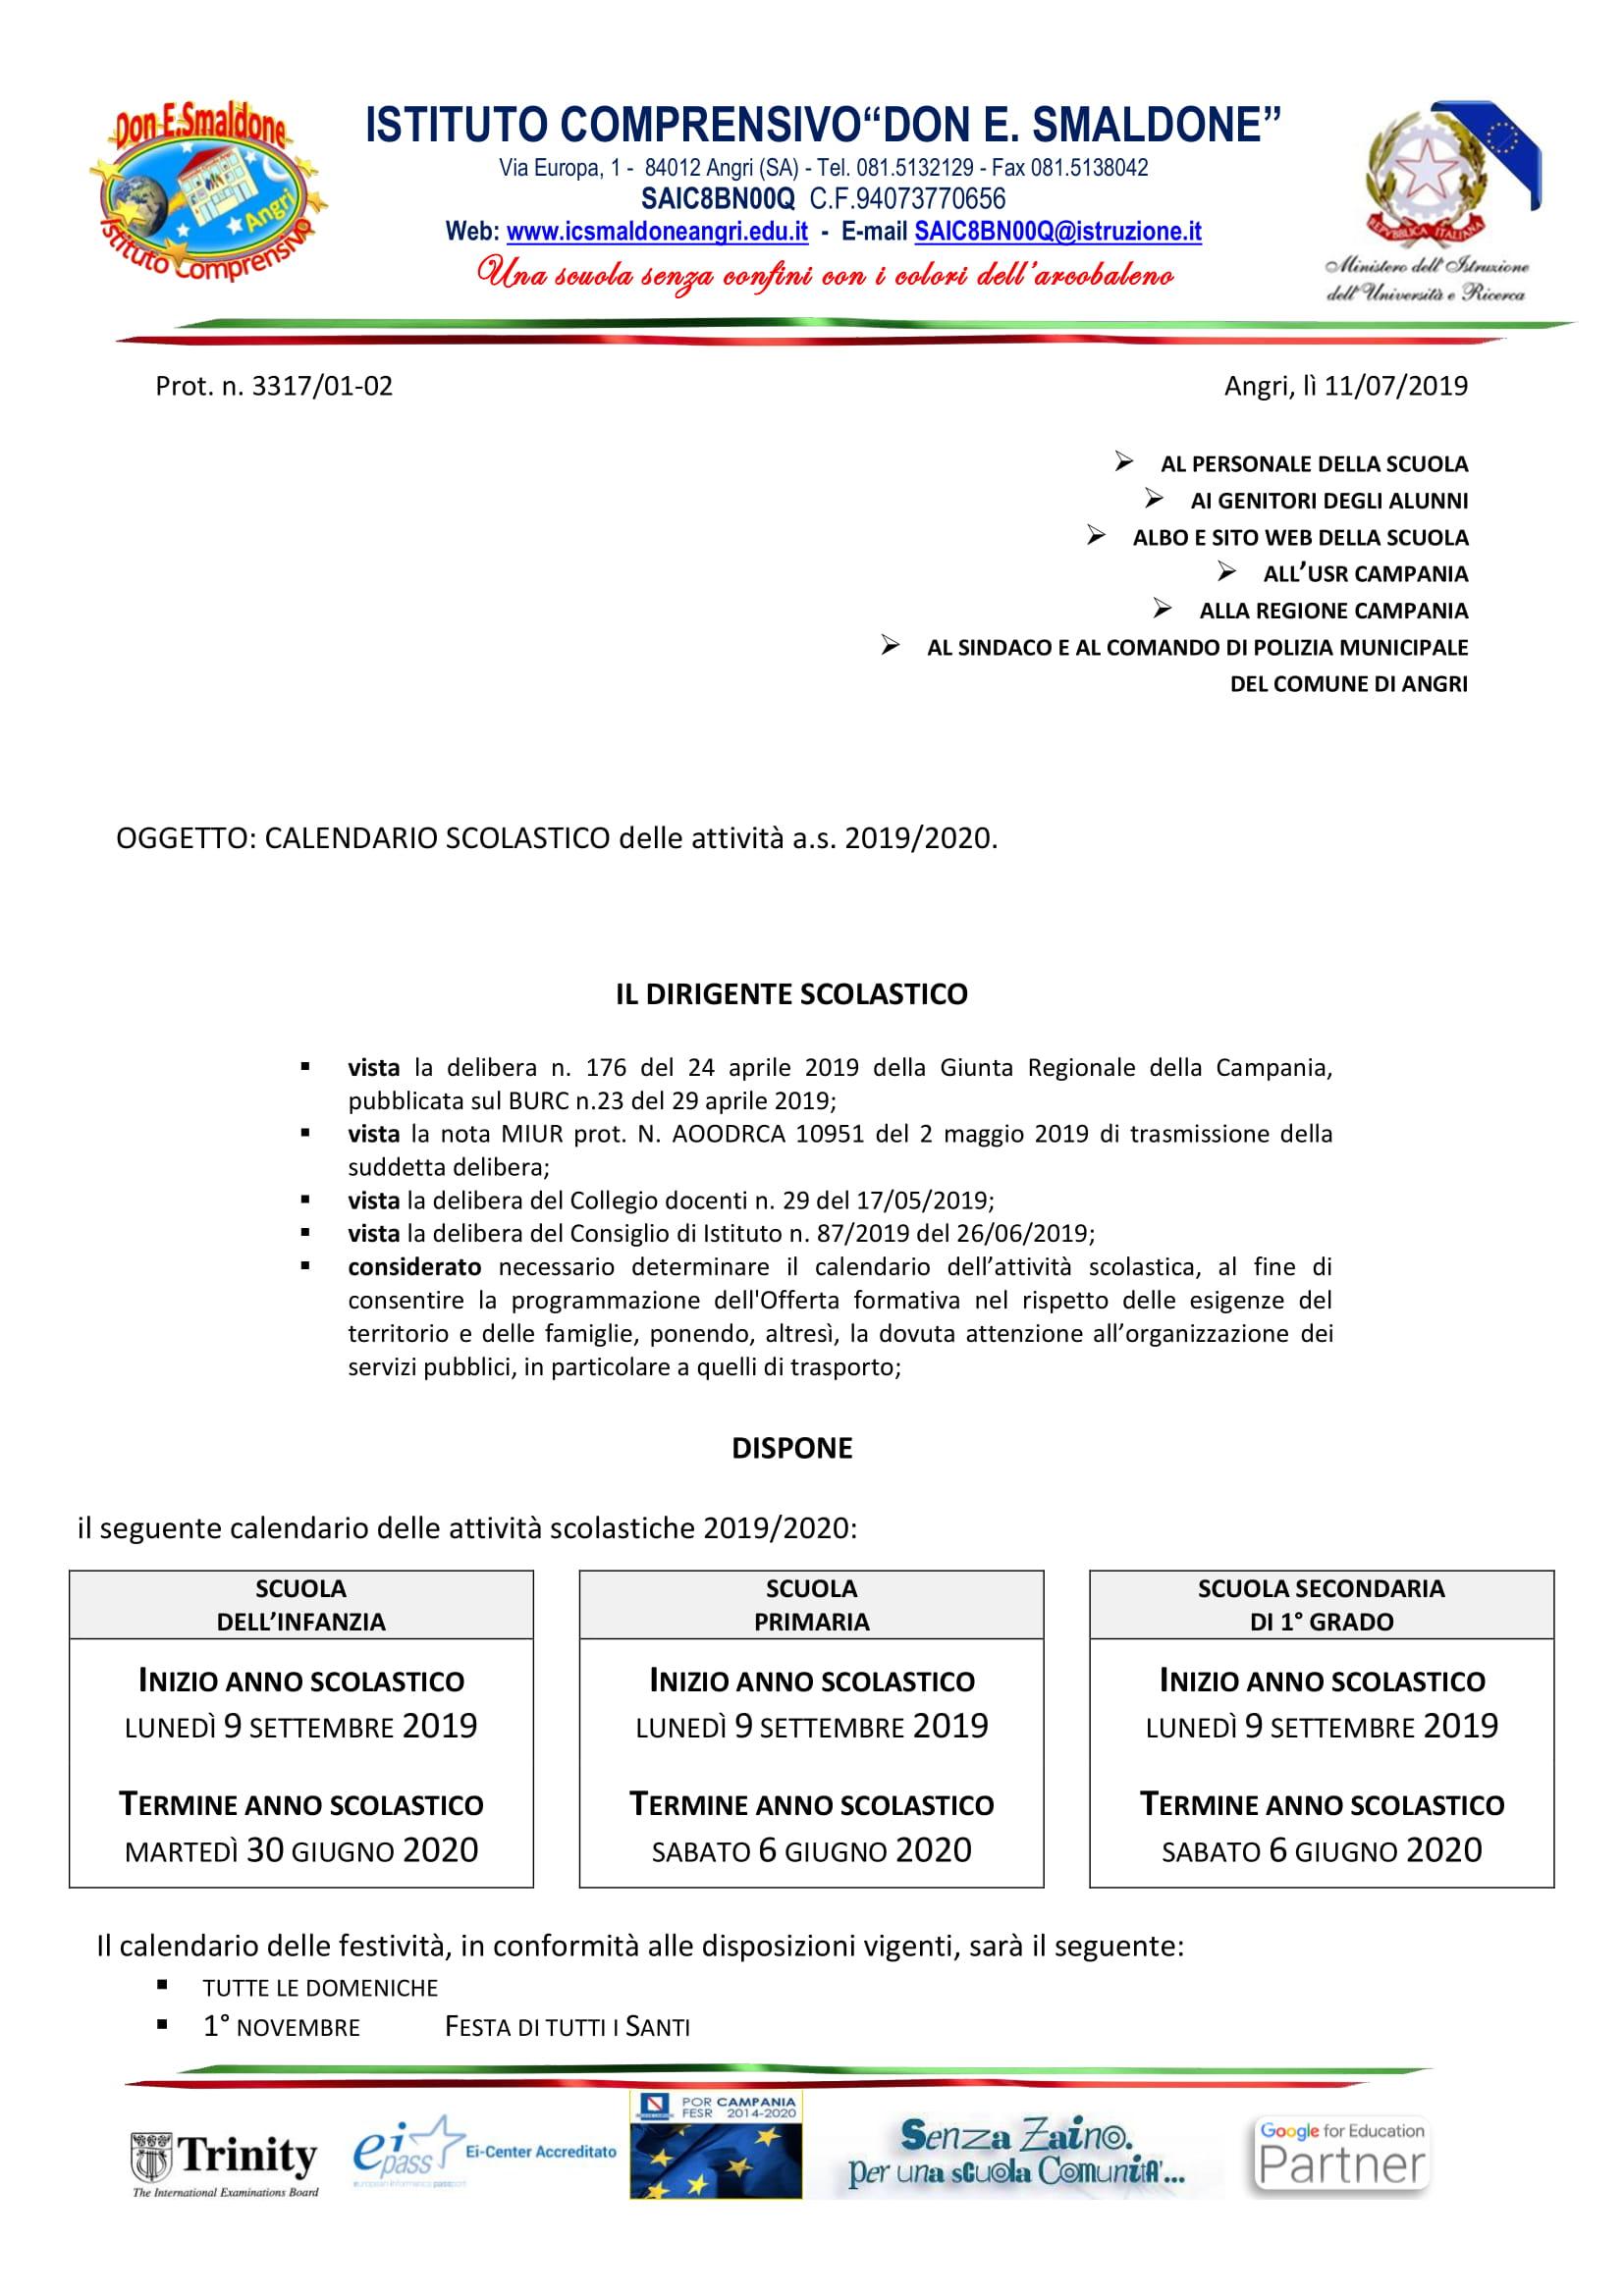 Novembre 2020 Calendario.Calendario Scolastico 2019 2020 Istituto Comprensivo Don